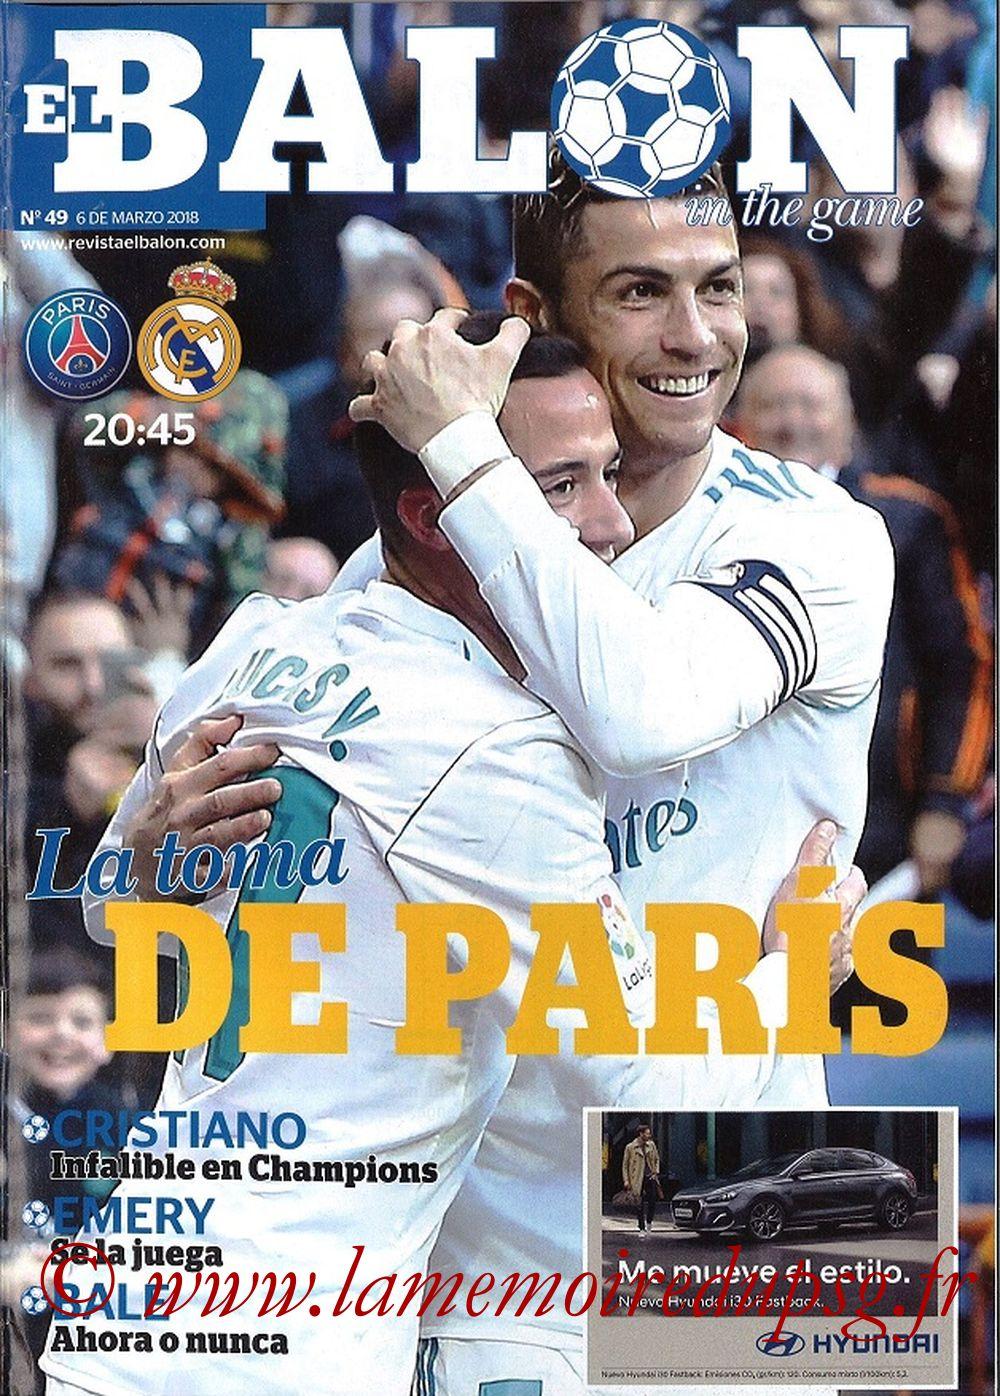 2018-03-06  PSG-Real Madrid (8ème Retourr C1, El Balon in the game N°49)